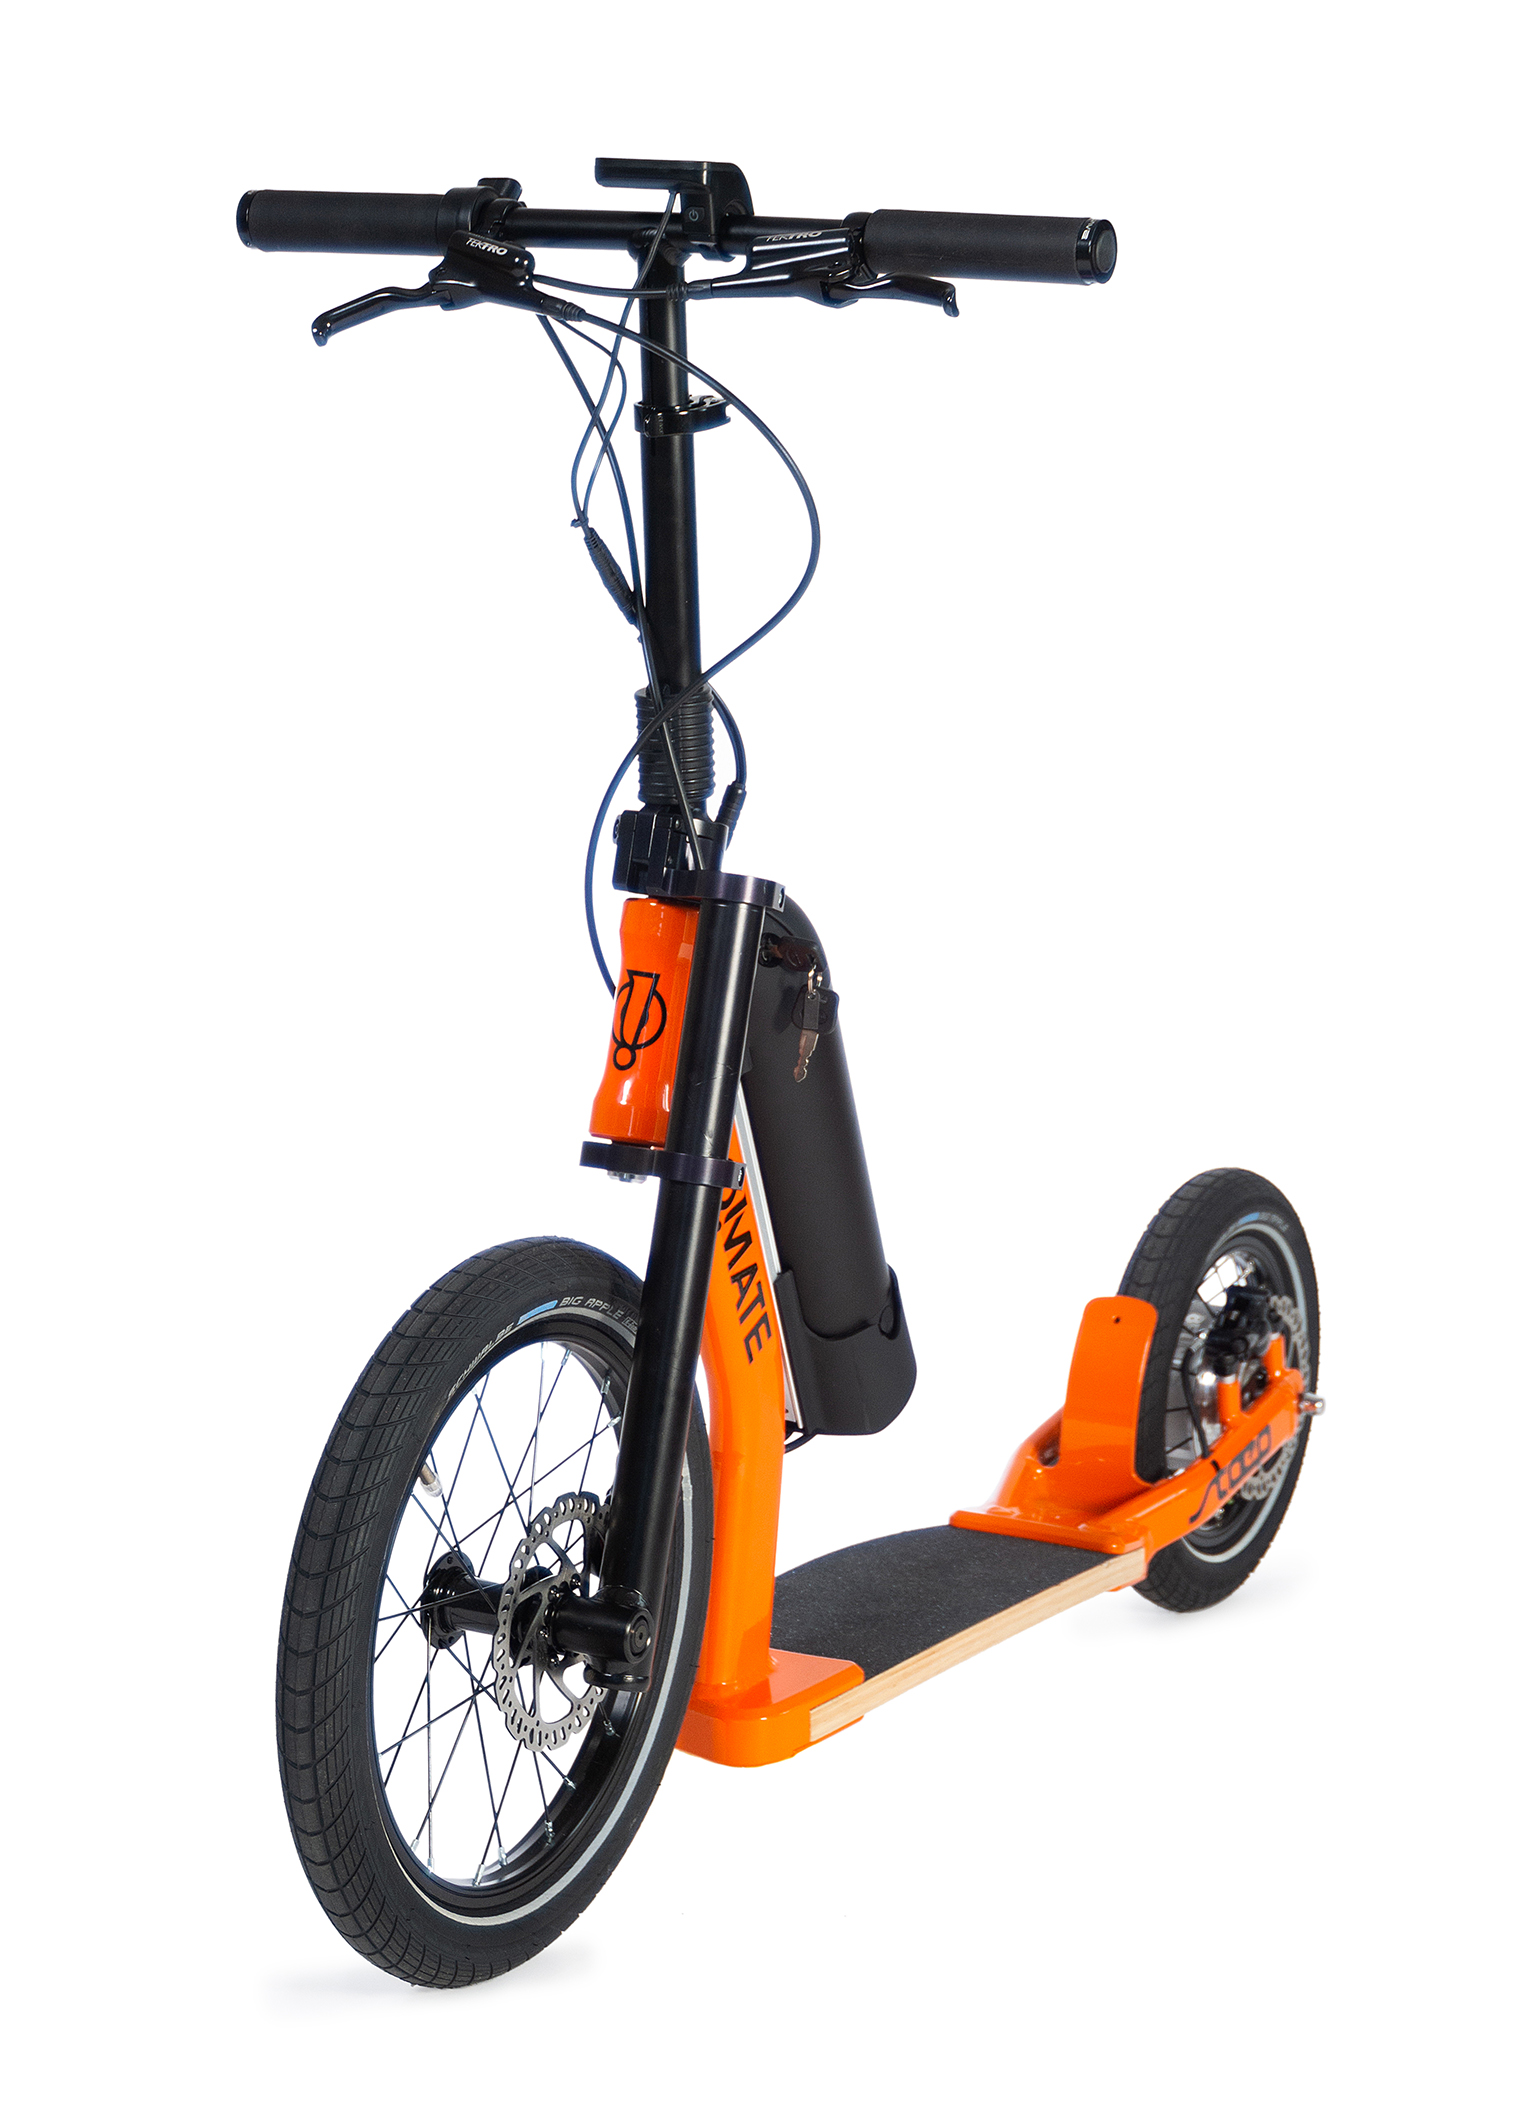 E-Scooter go!mate stæp ER2 PLUS mit Strassenzulassung